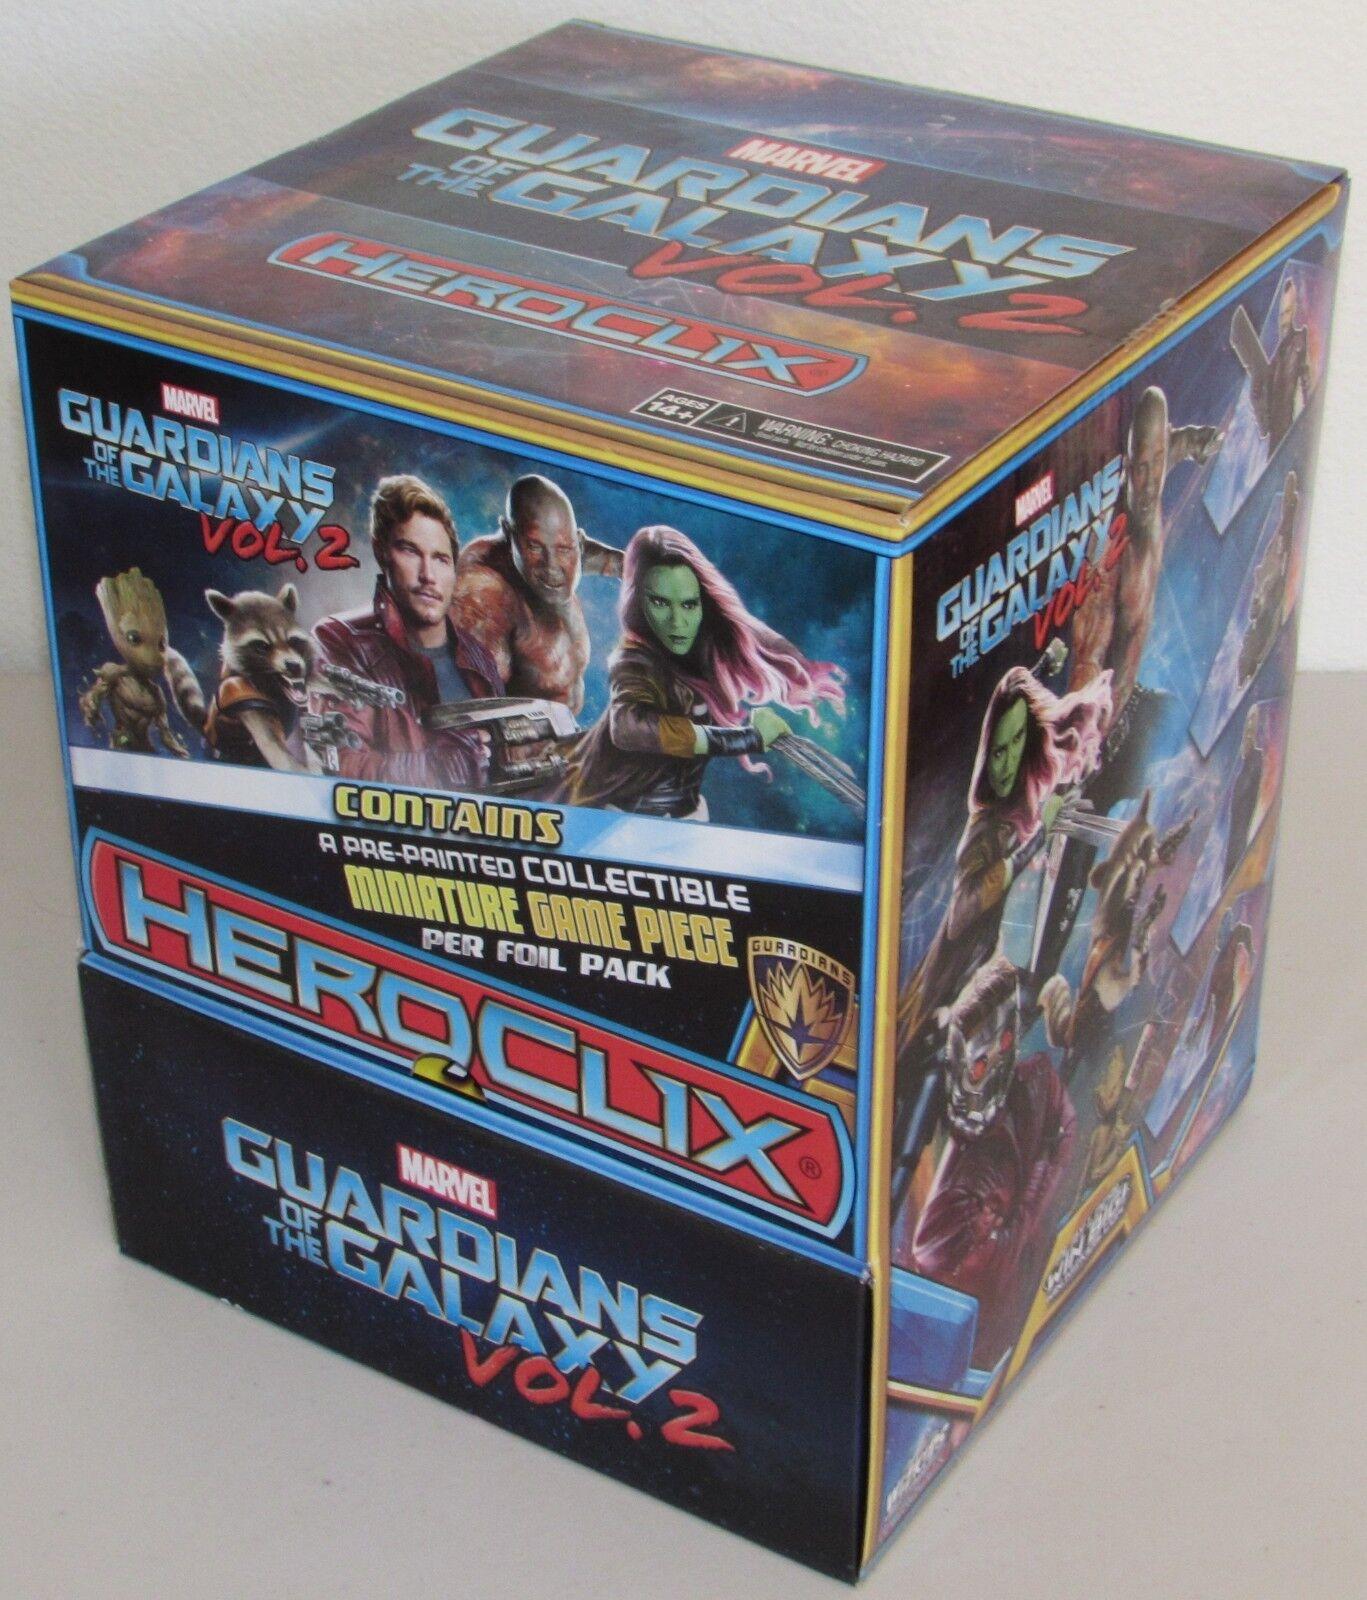 Guardianes de la Galaxia Película Vol 2 Wizkids Heroclix Gravity Feed Impulsor